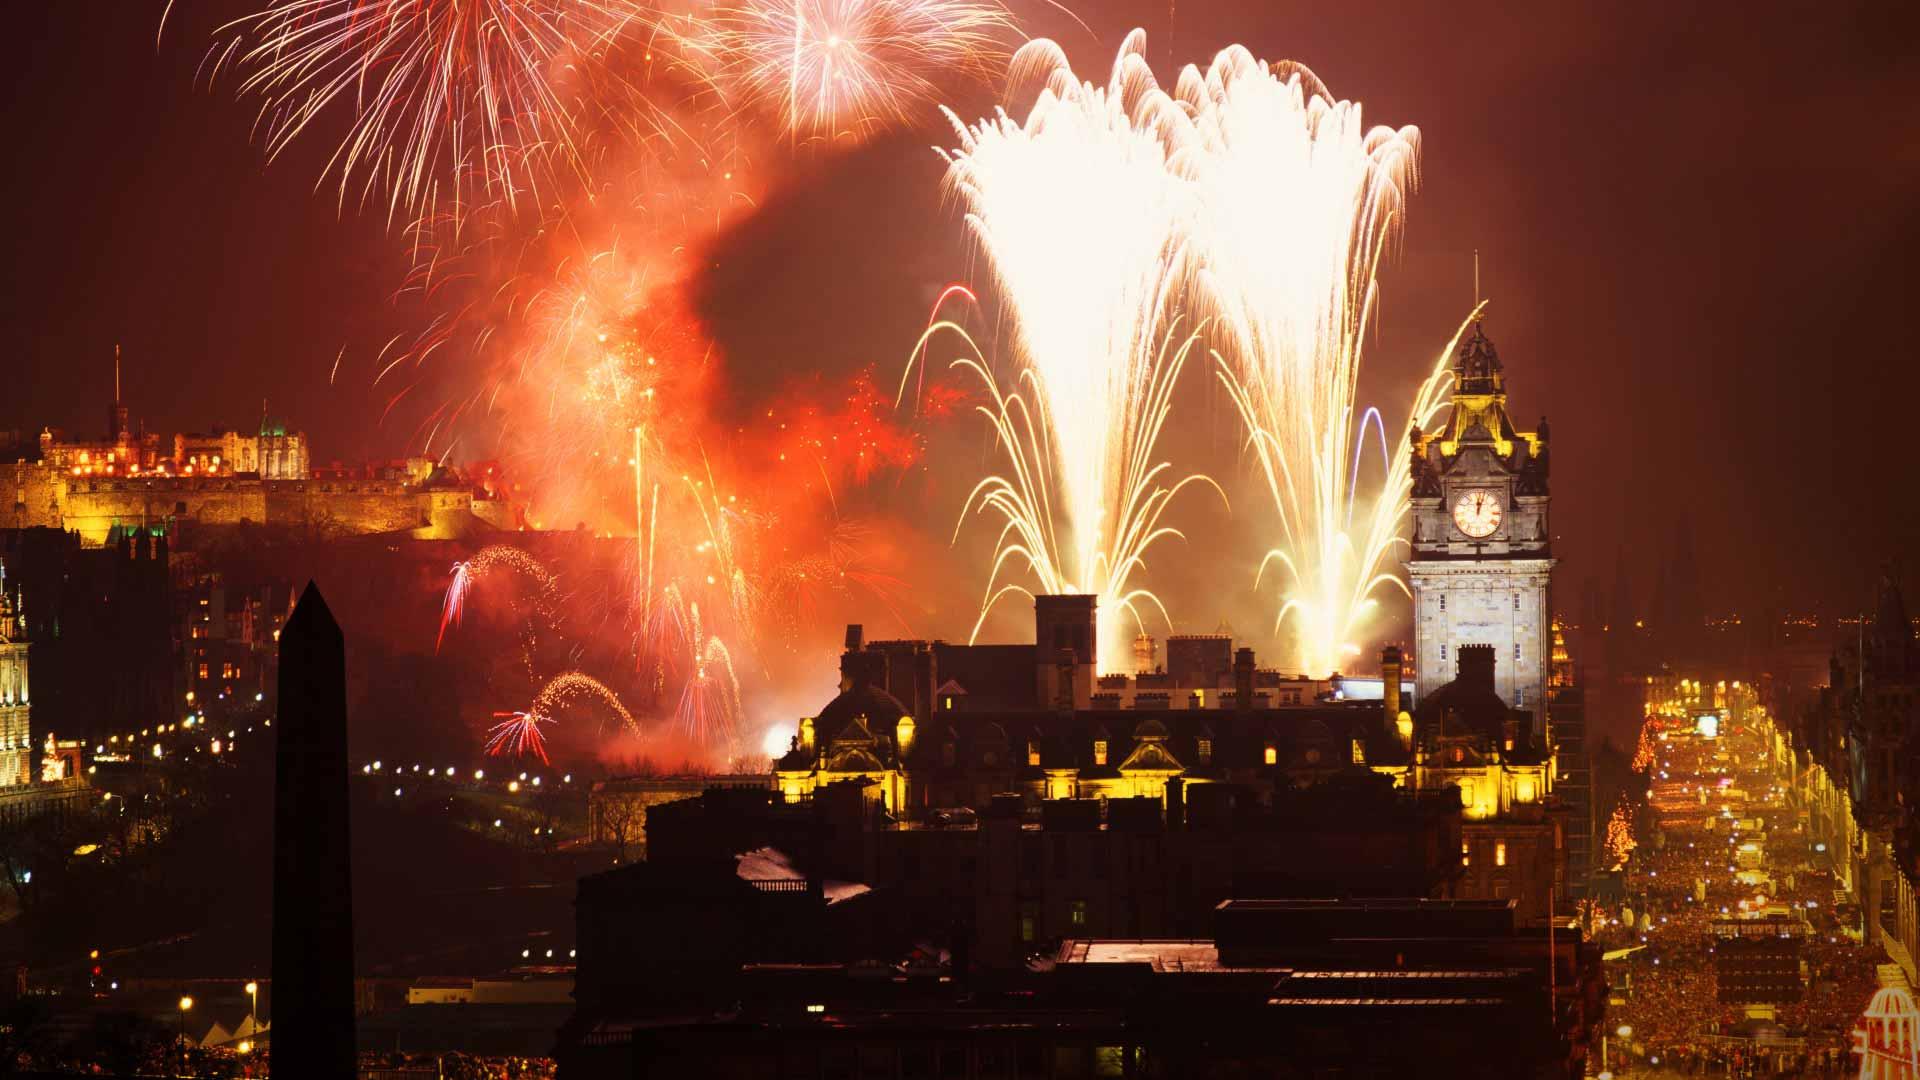 2013-12-30_EN-GB9204888925_Hogmanay-Party-in-Princes-Street-Edinburgh-Scotland-UK_1920x1080